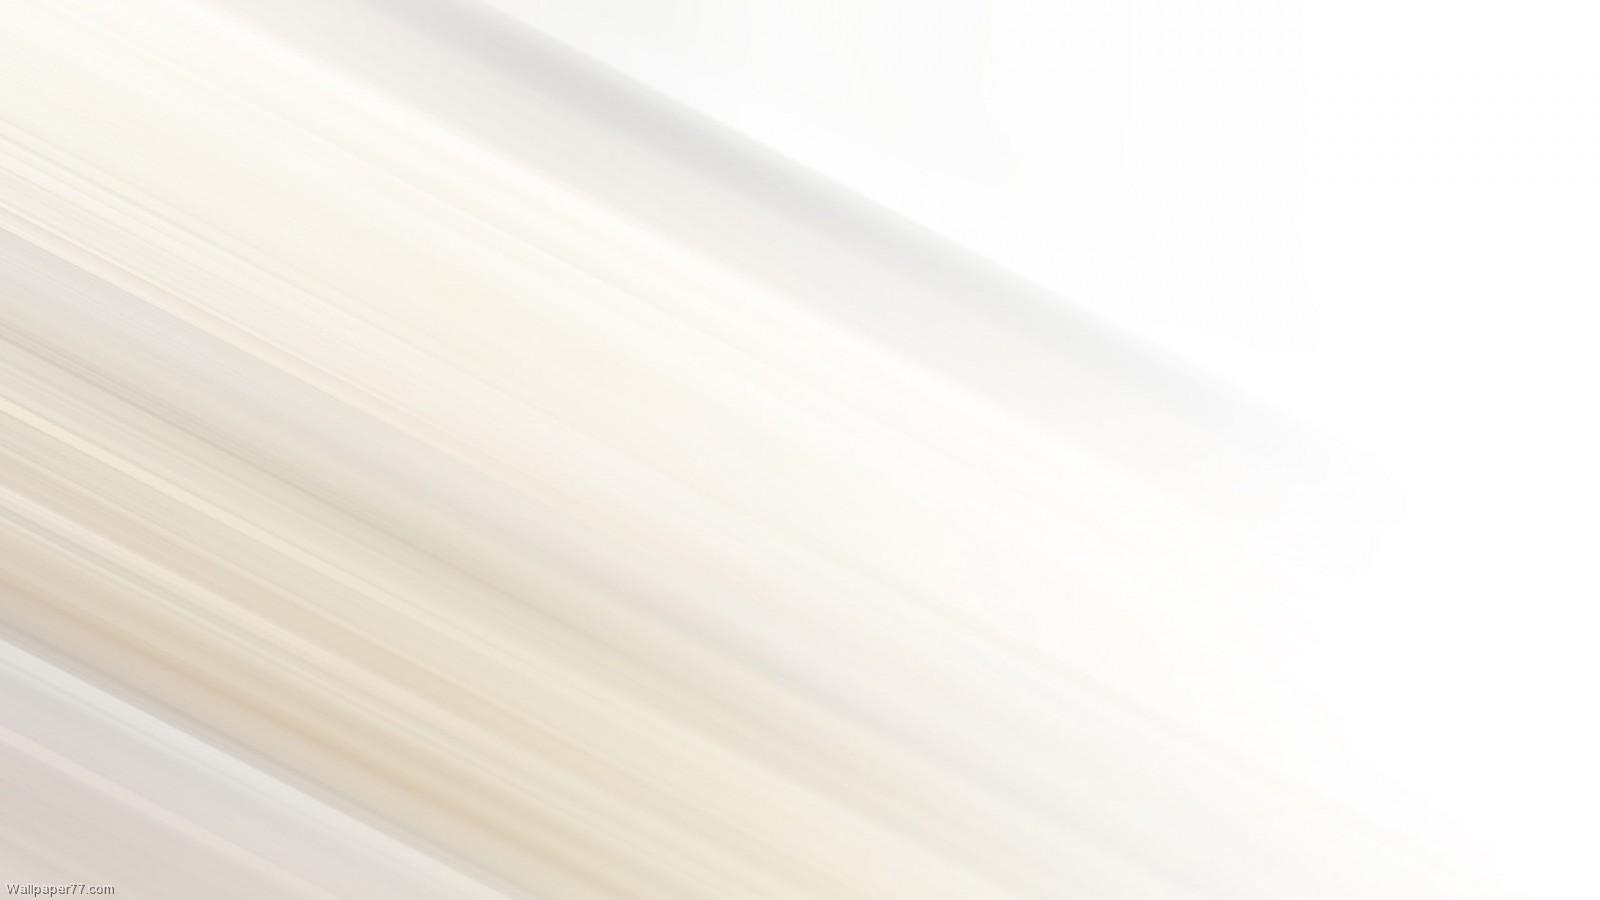 Pattern White Sand background patterns pattern wallpapers 1600x900jpg 1600x900